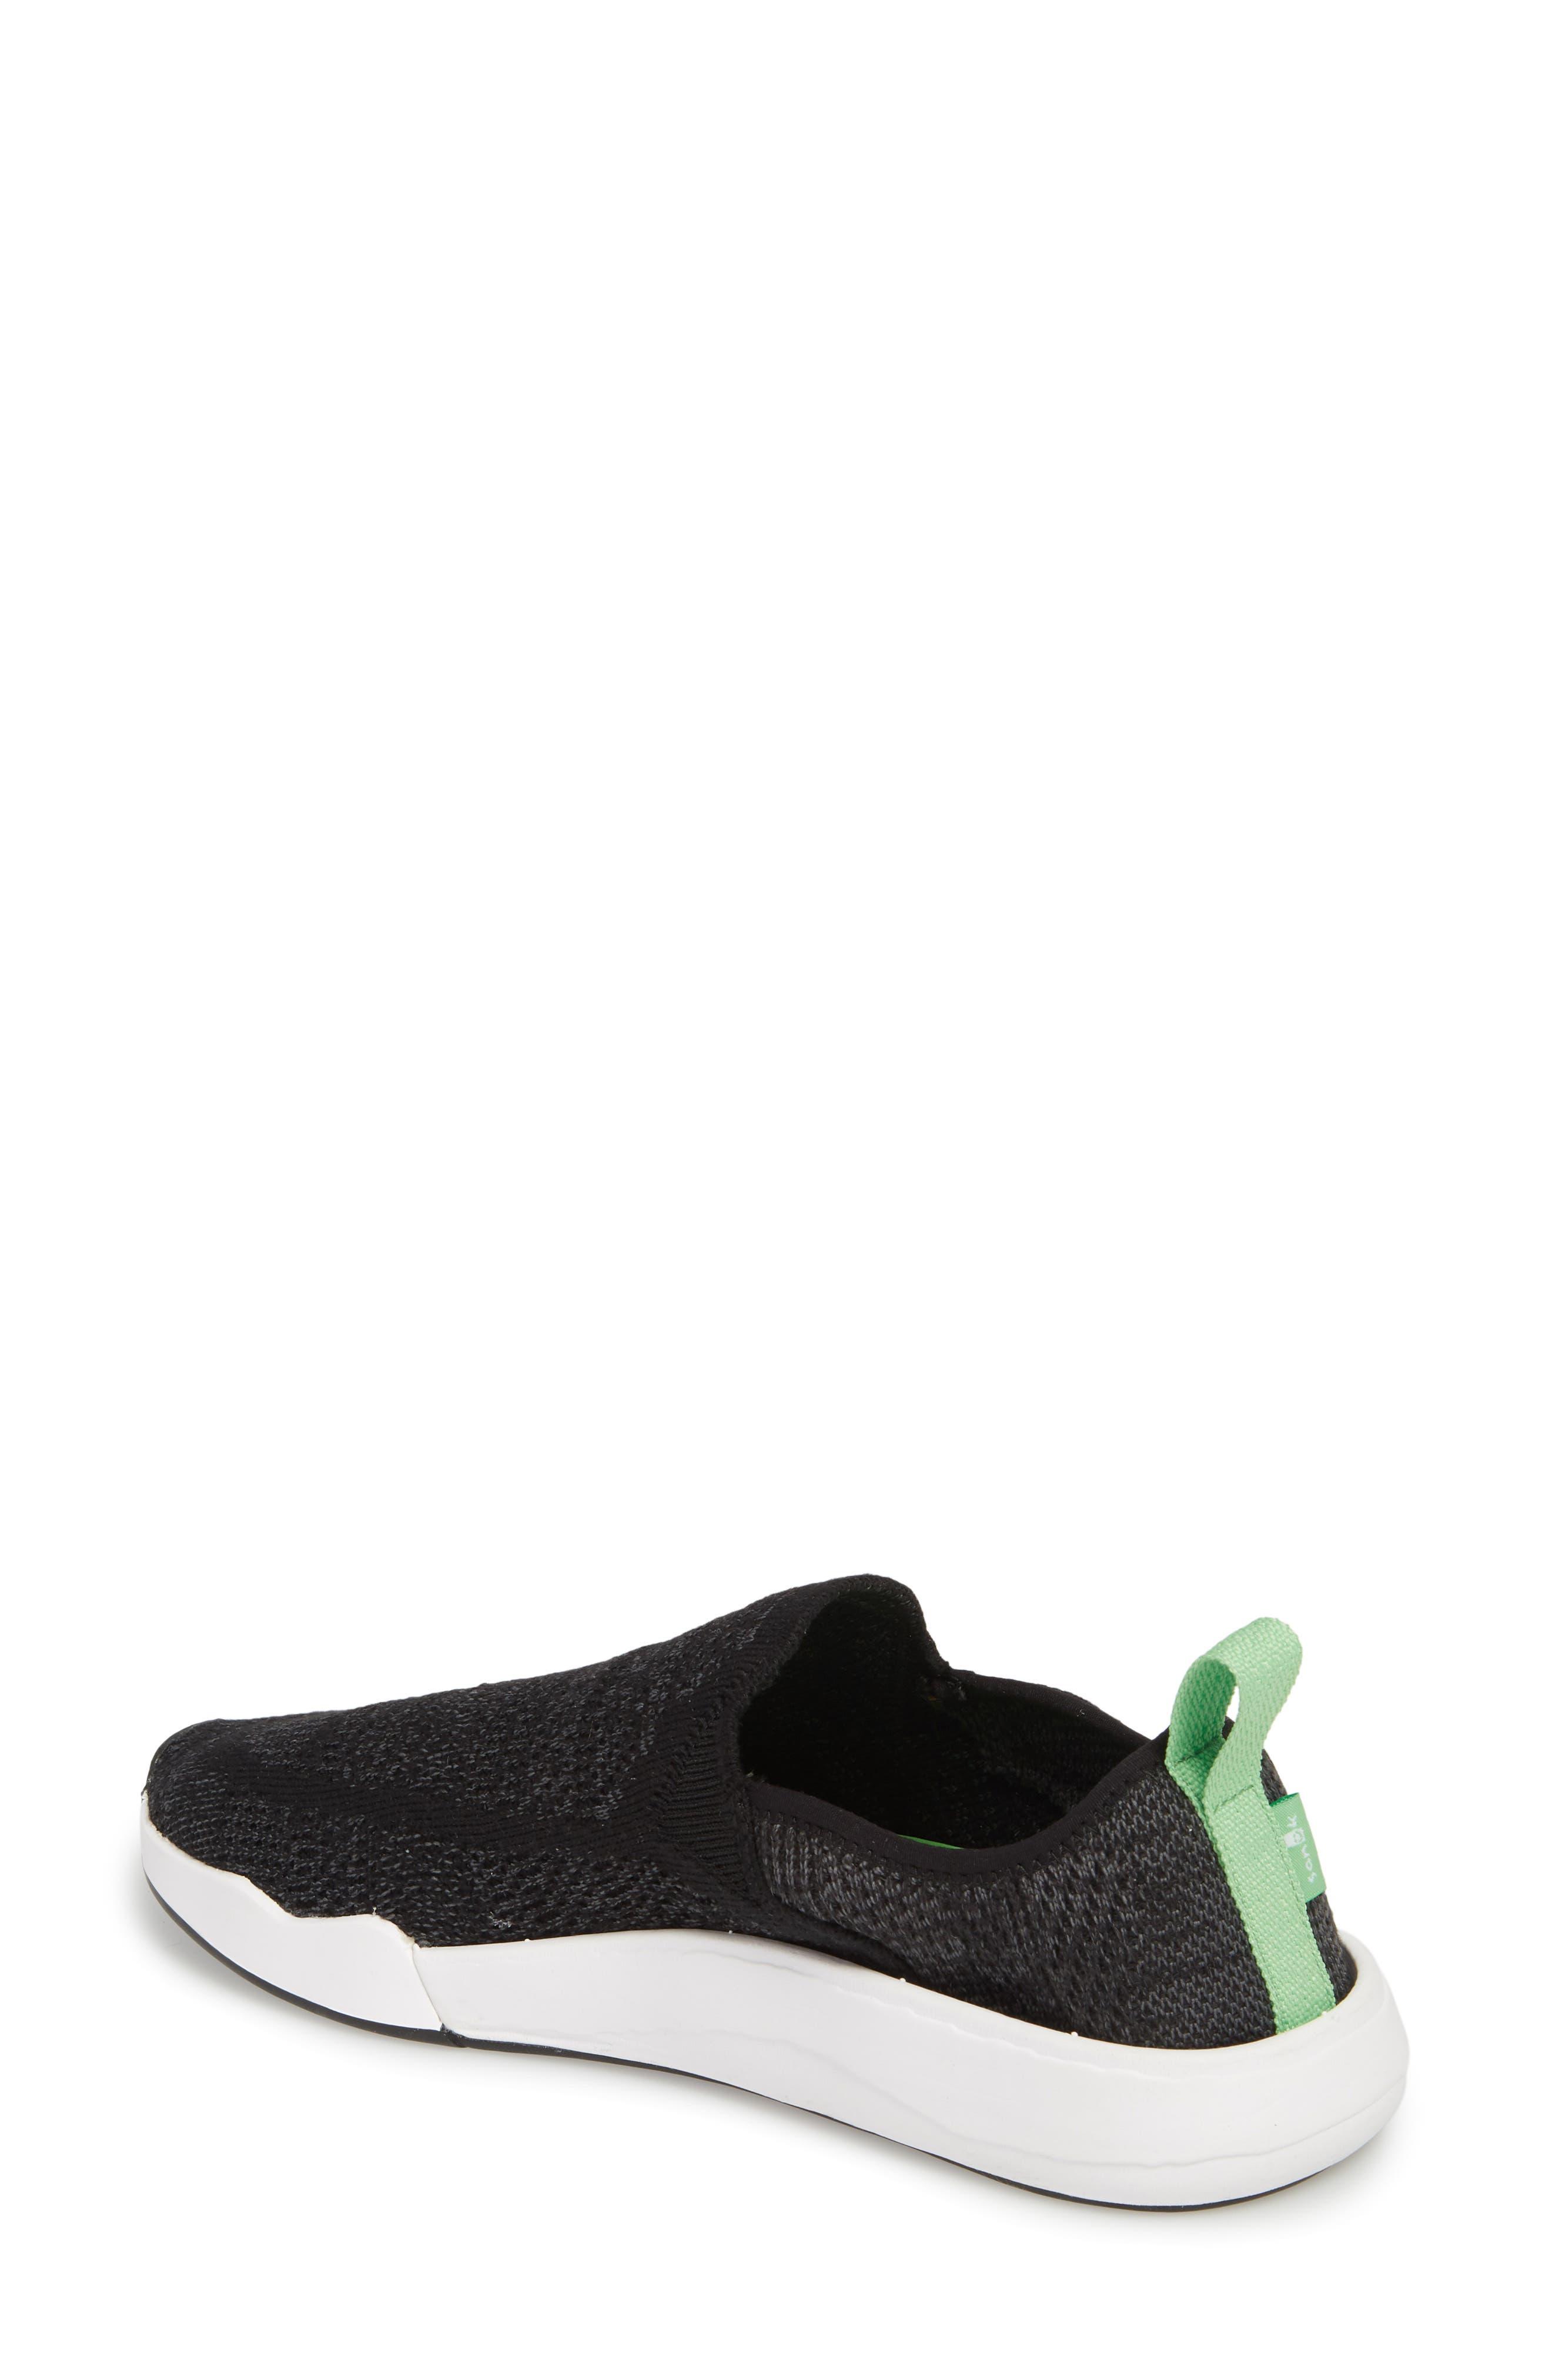 SANUK, Chiba Quest Knit Slip-On Sneaker, Alternate thumbnail 2, color, BLACK